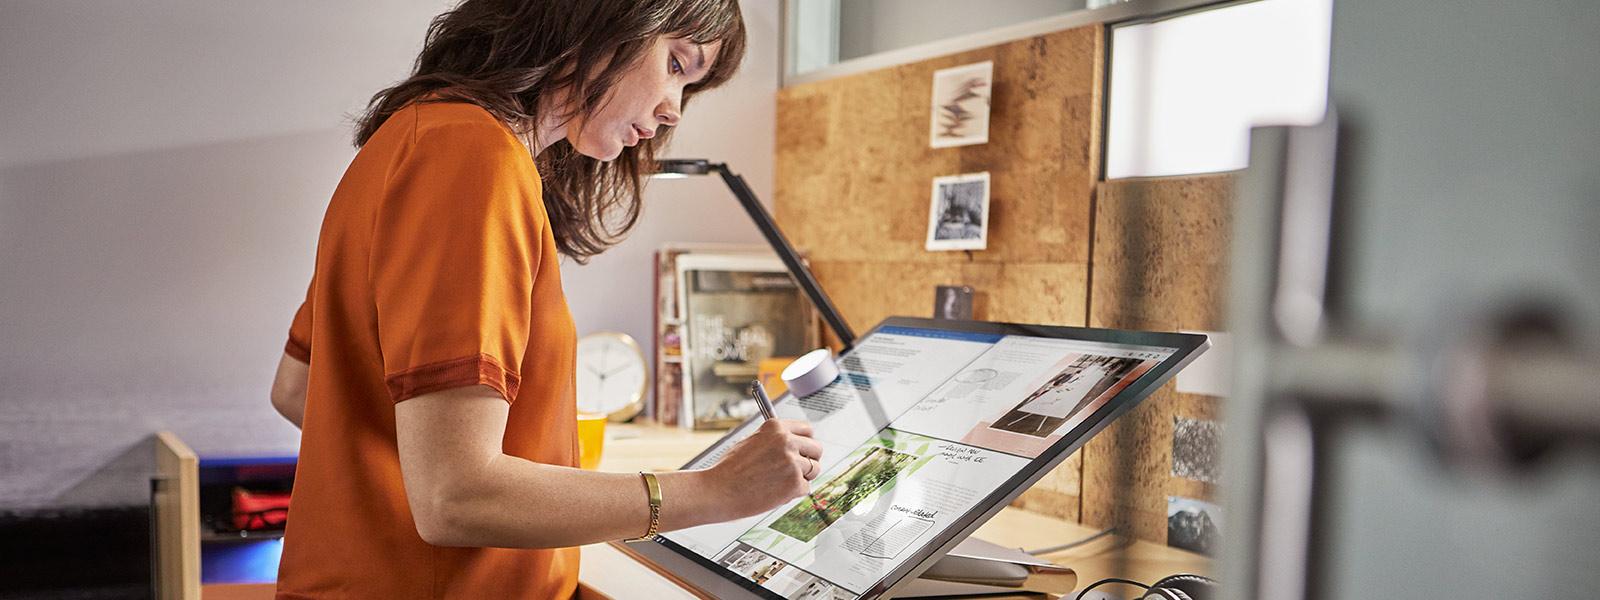 Woman uses pen on Surface Studio.